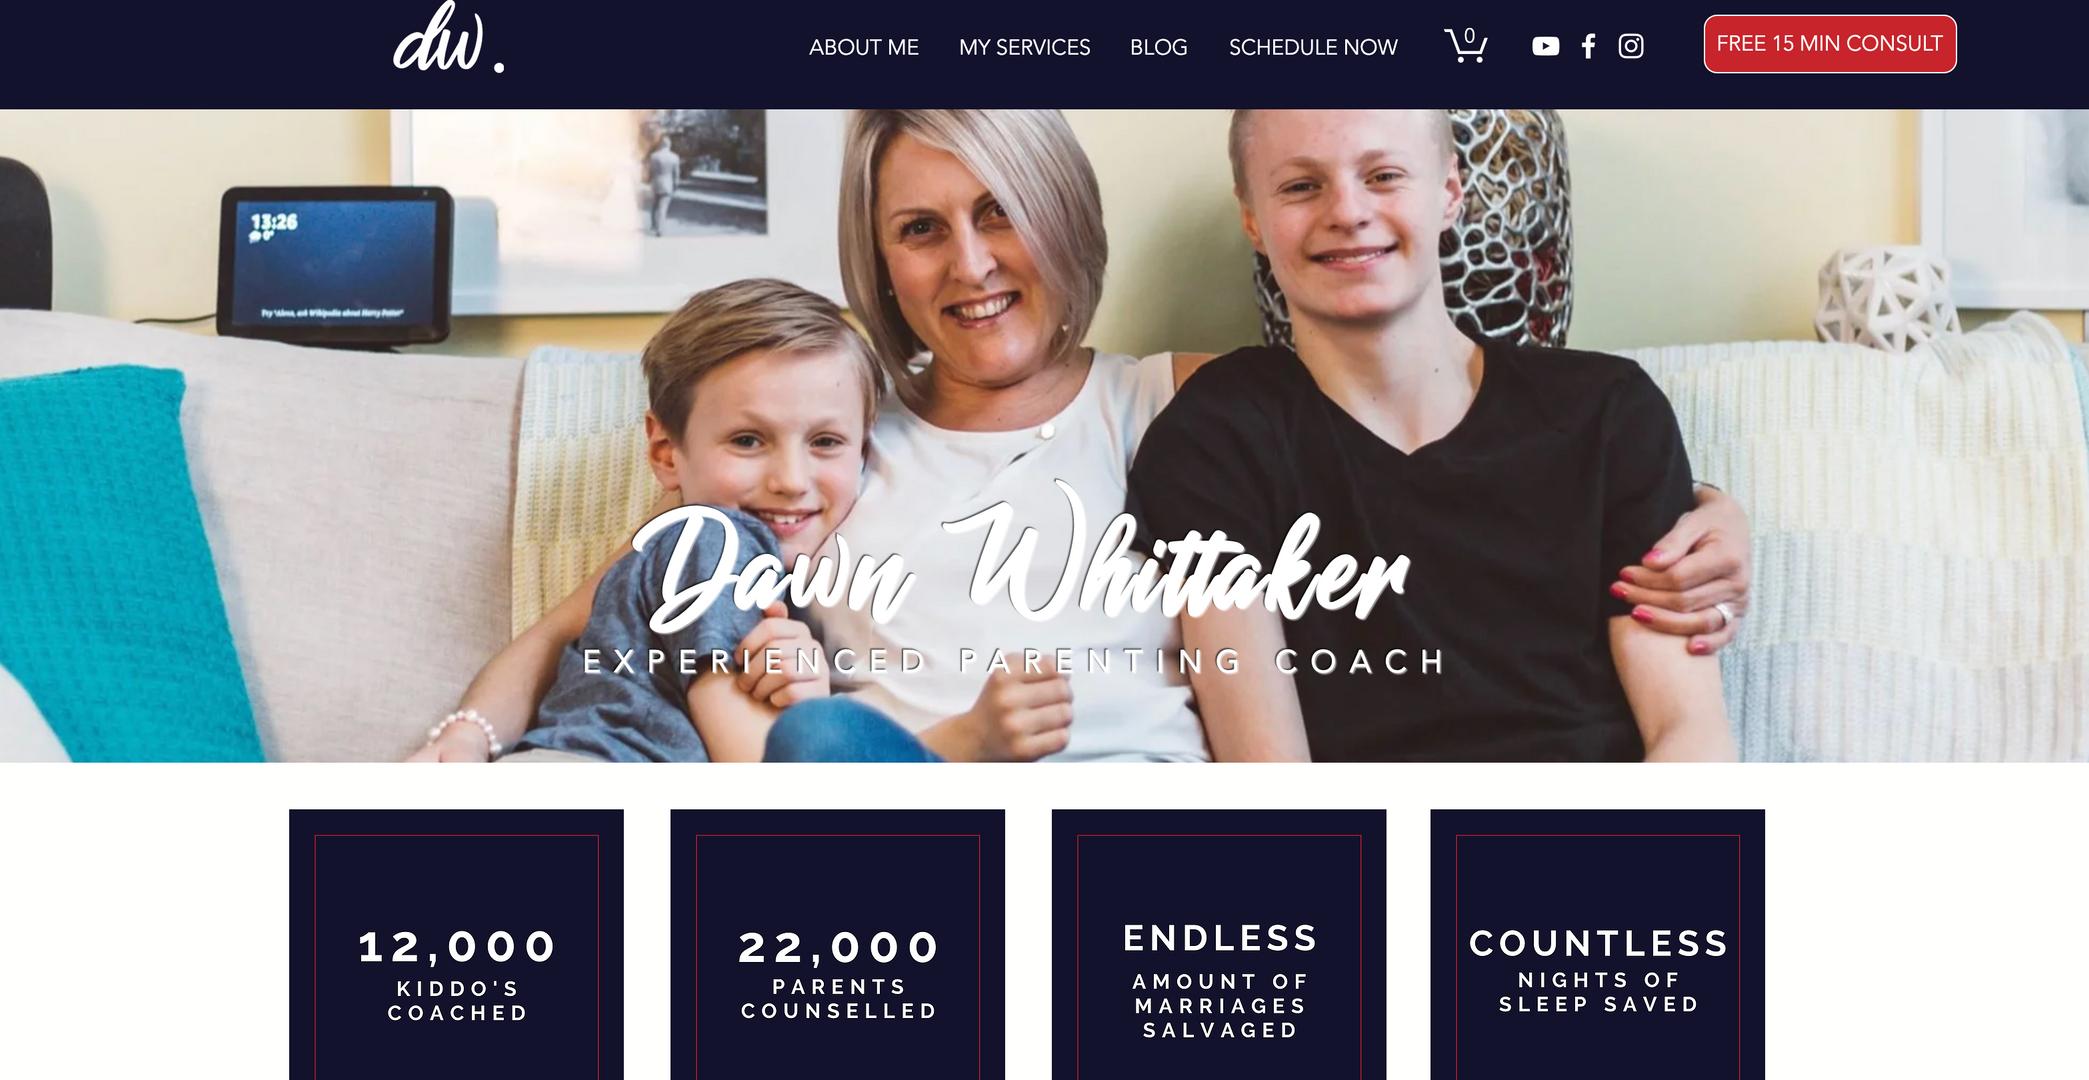 Dawn Whittaker | Parenting Coach